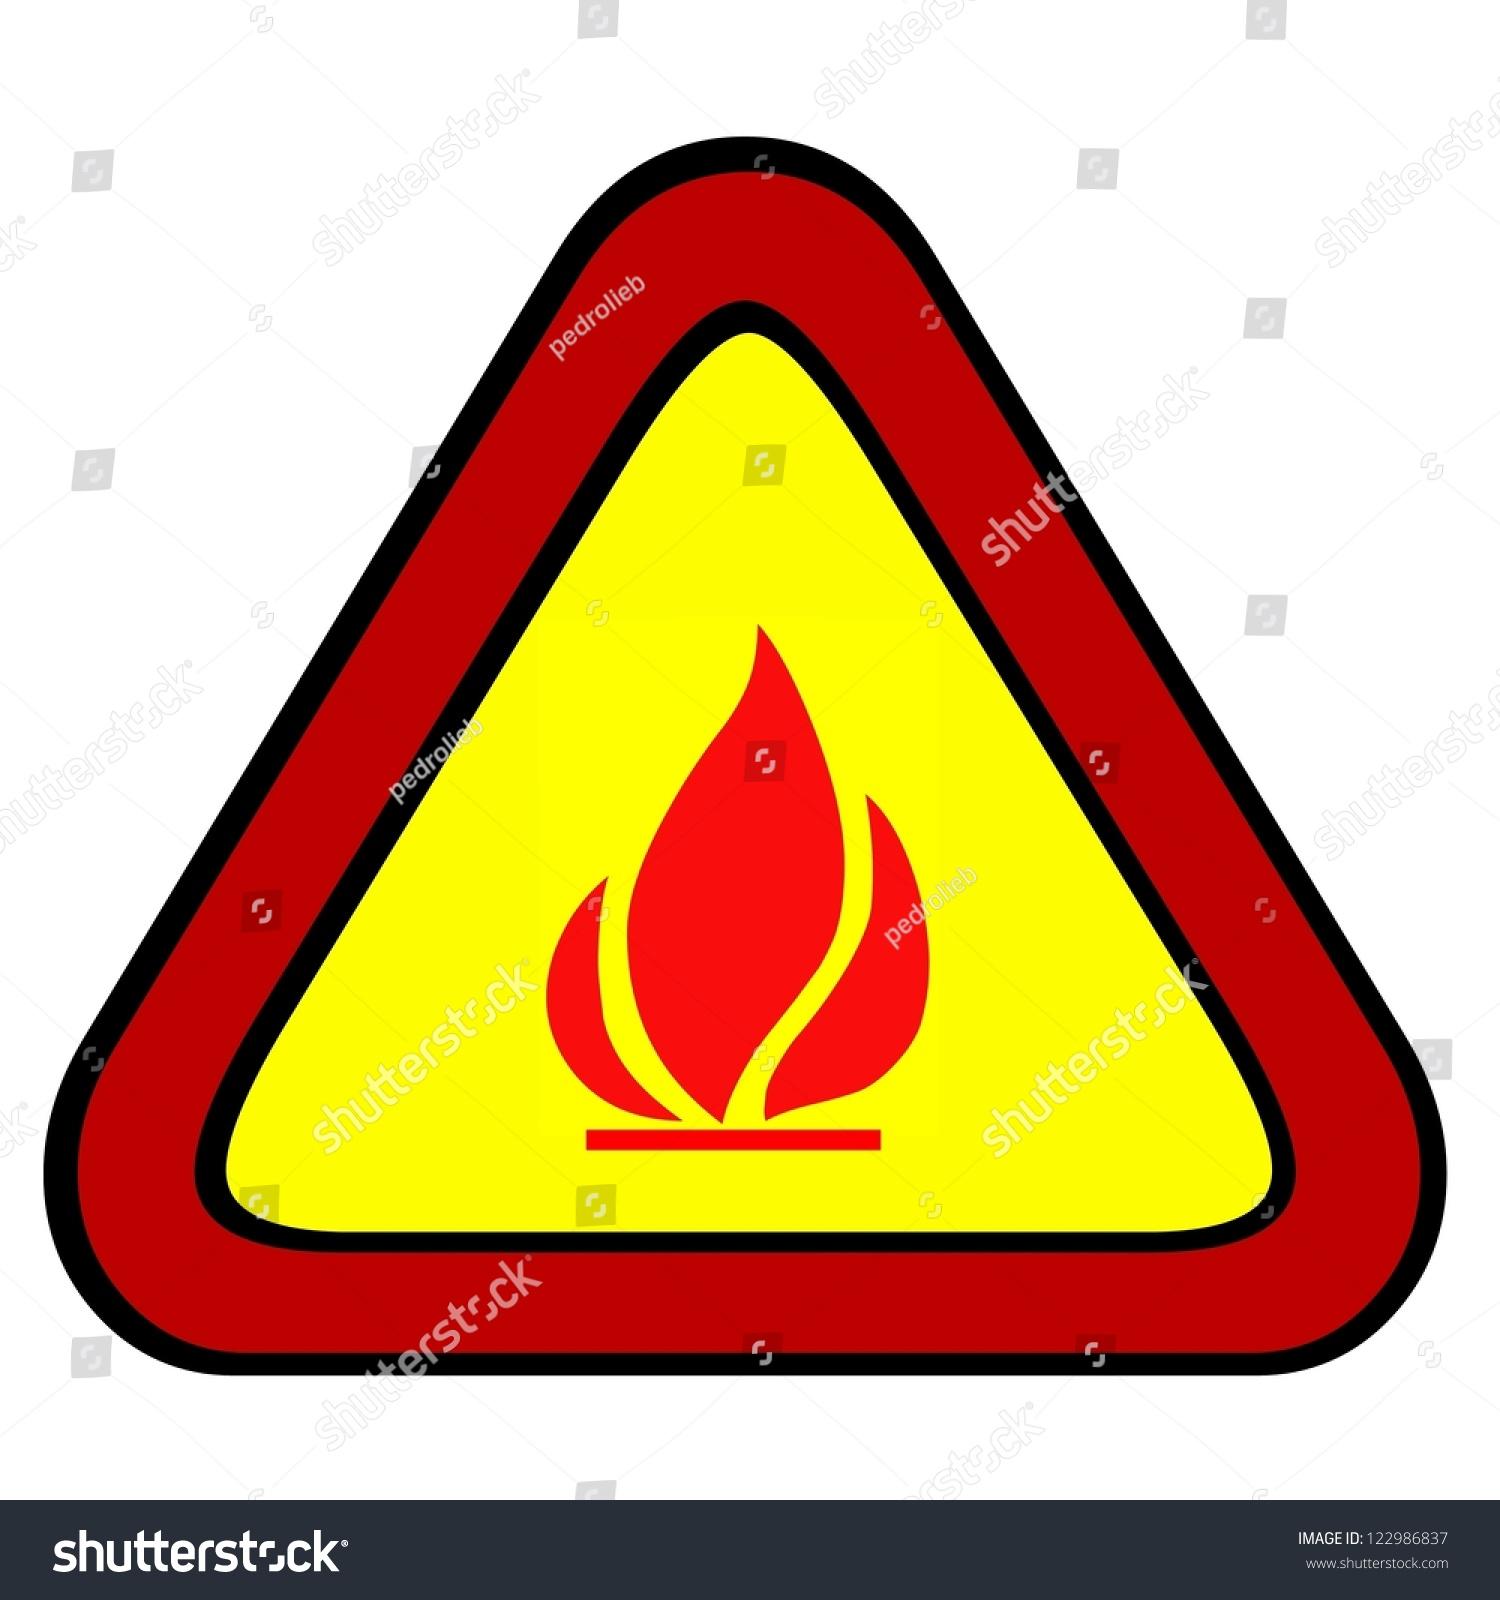 Flammable fire hazard warning symbol on stock illustration flammable fire hazard warning symbol on yellow triangular sign biocorpaavc Gallery